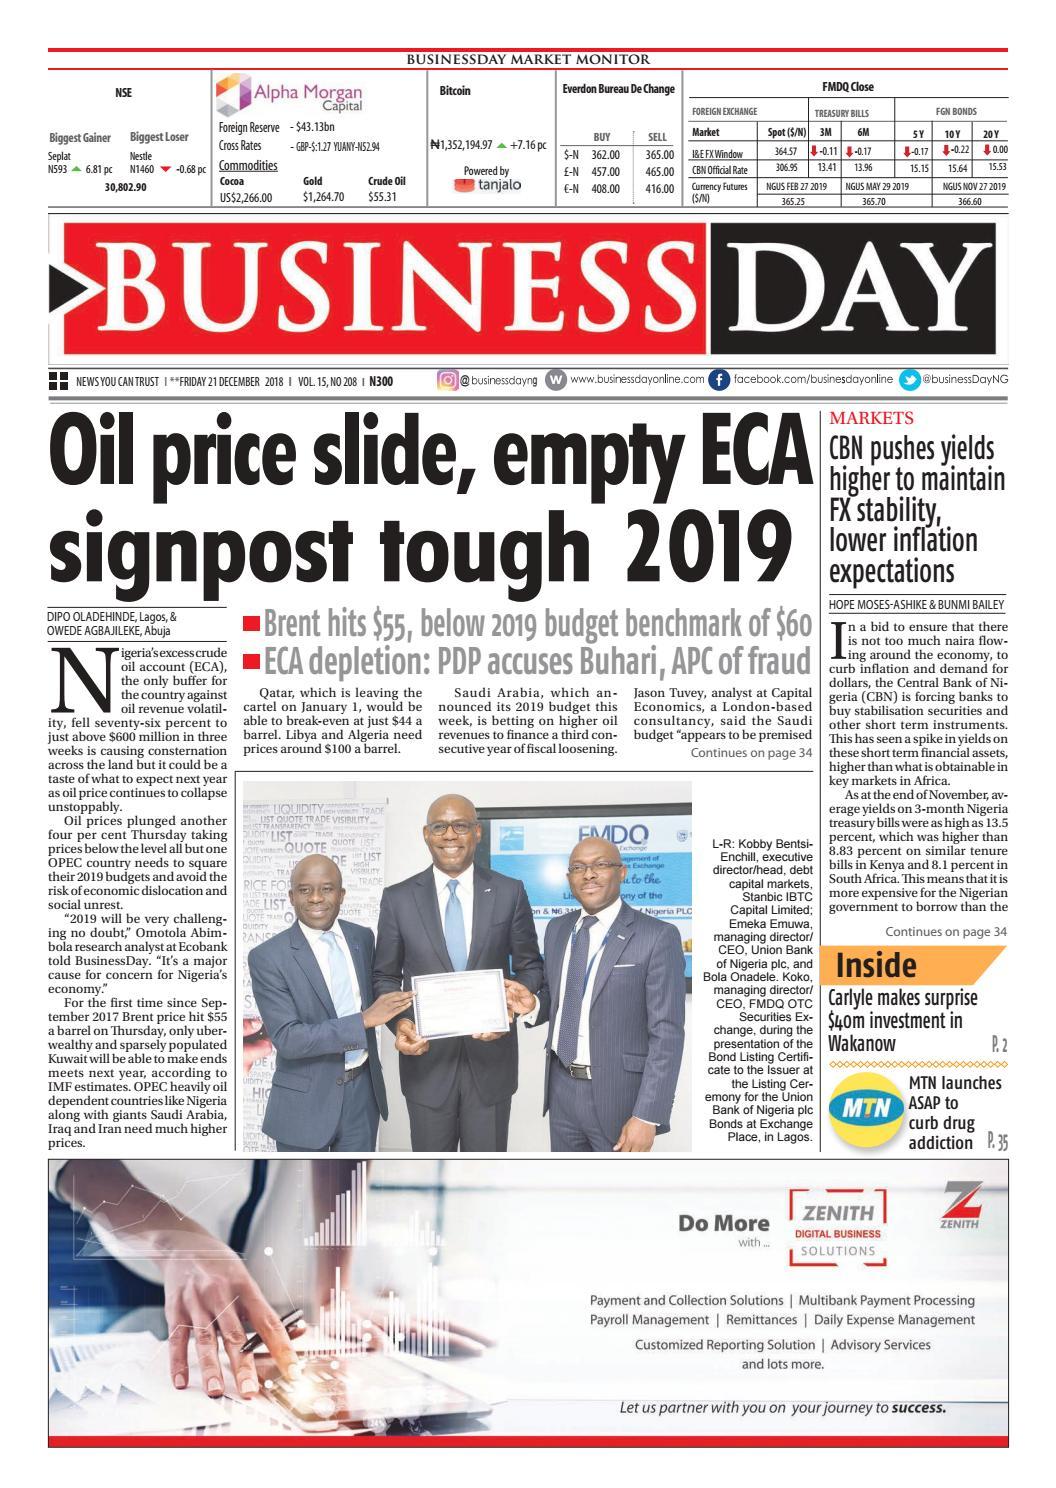 Hyping Paulsons Big Regulatory Reform >> Businessday 21 Dec 2018 By Businessday Issuu